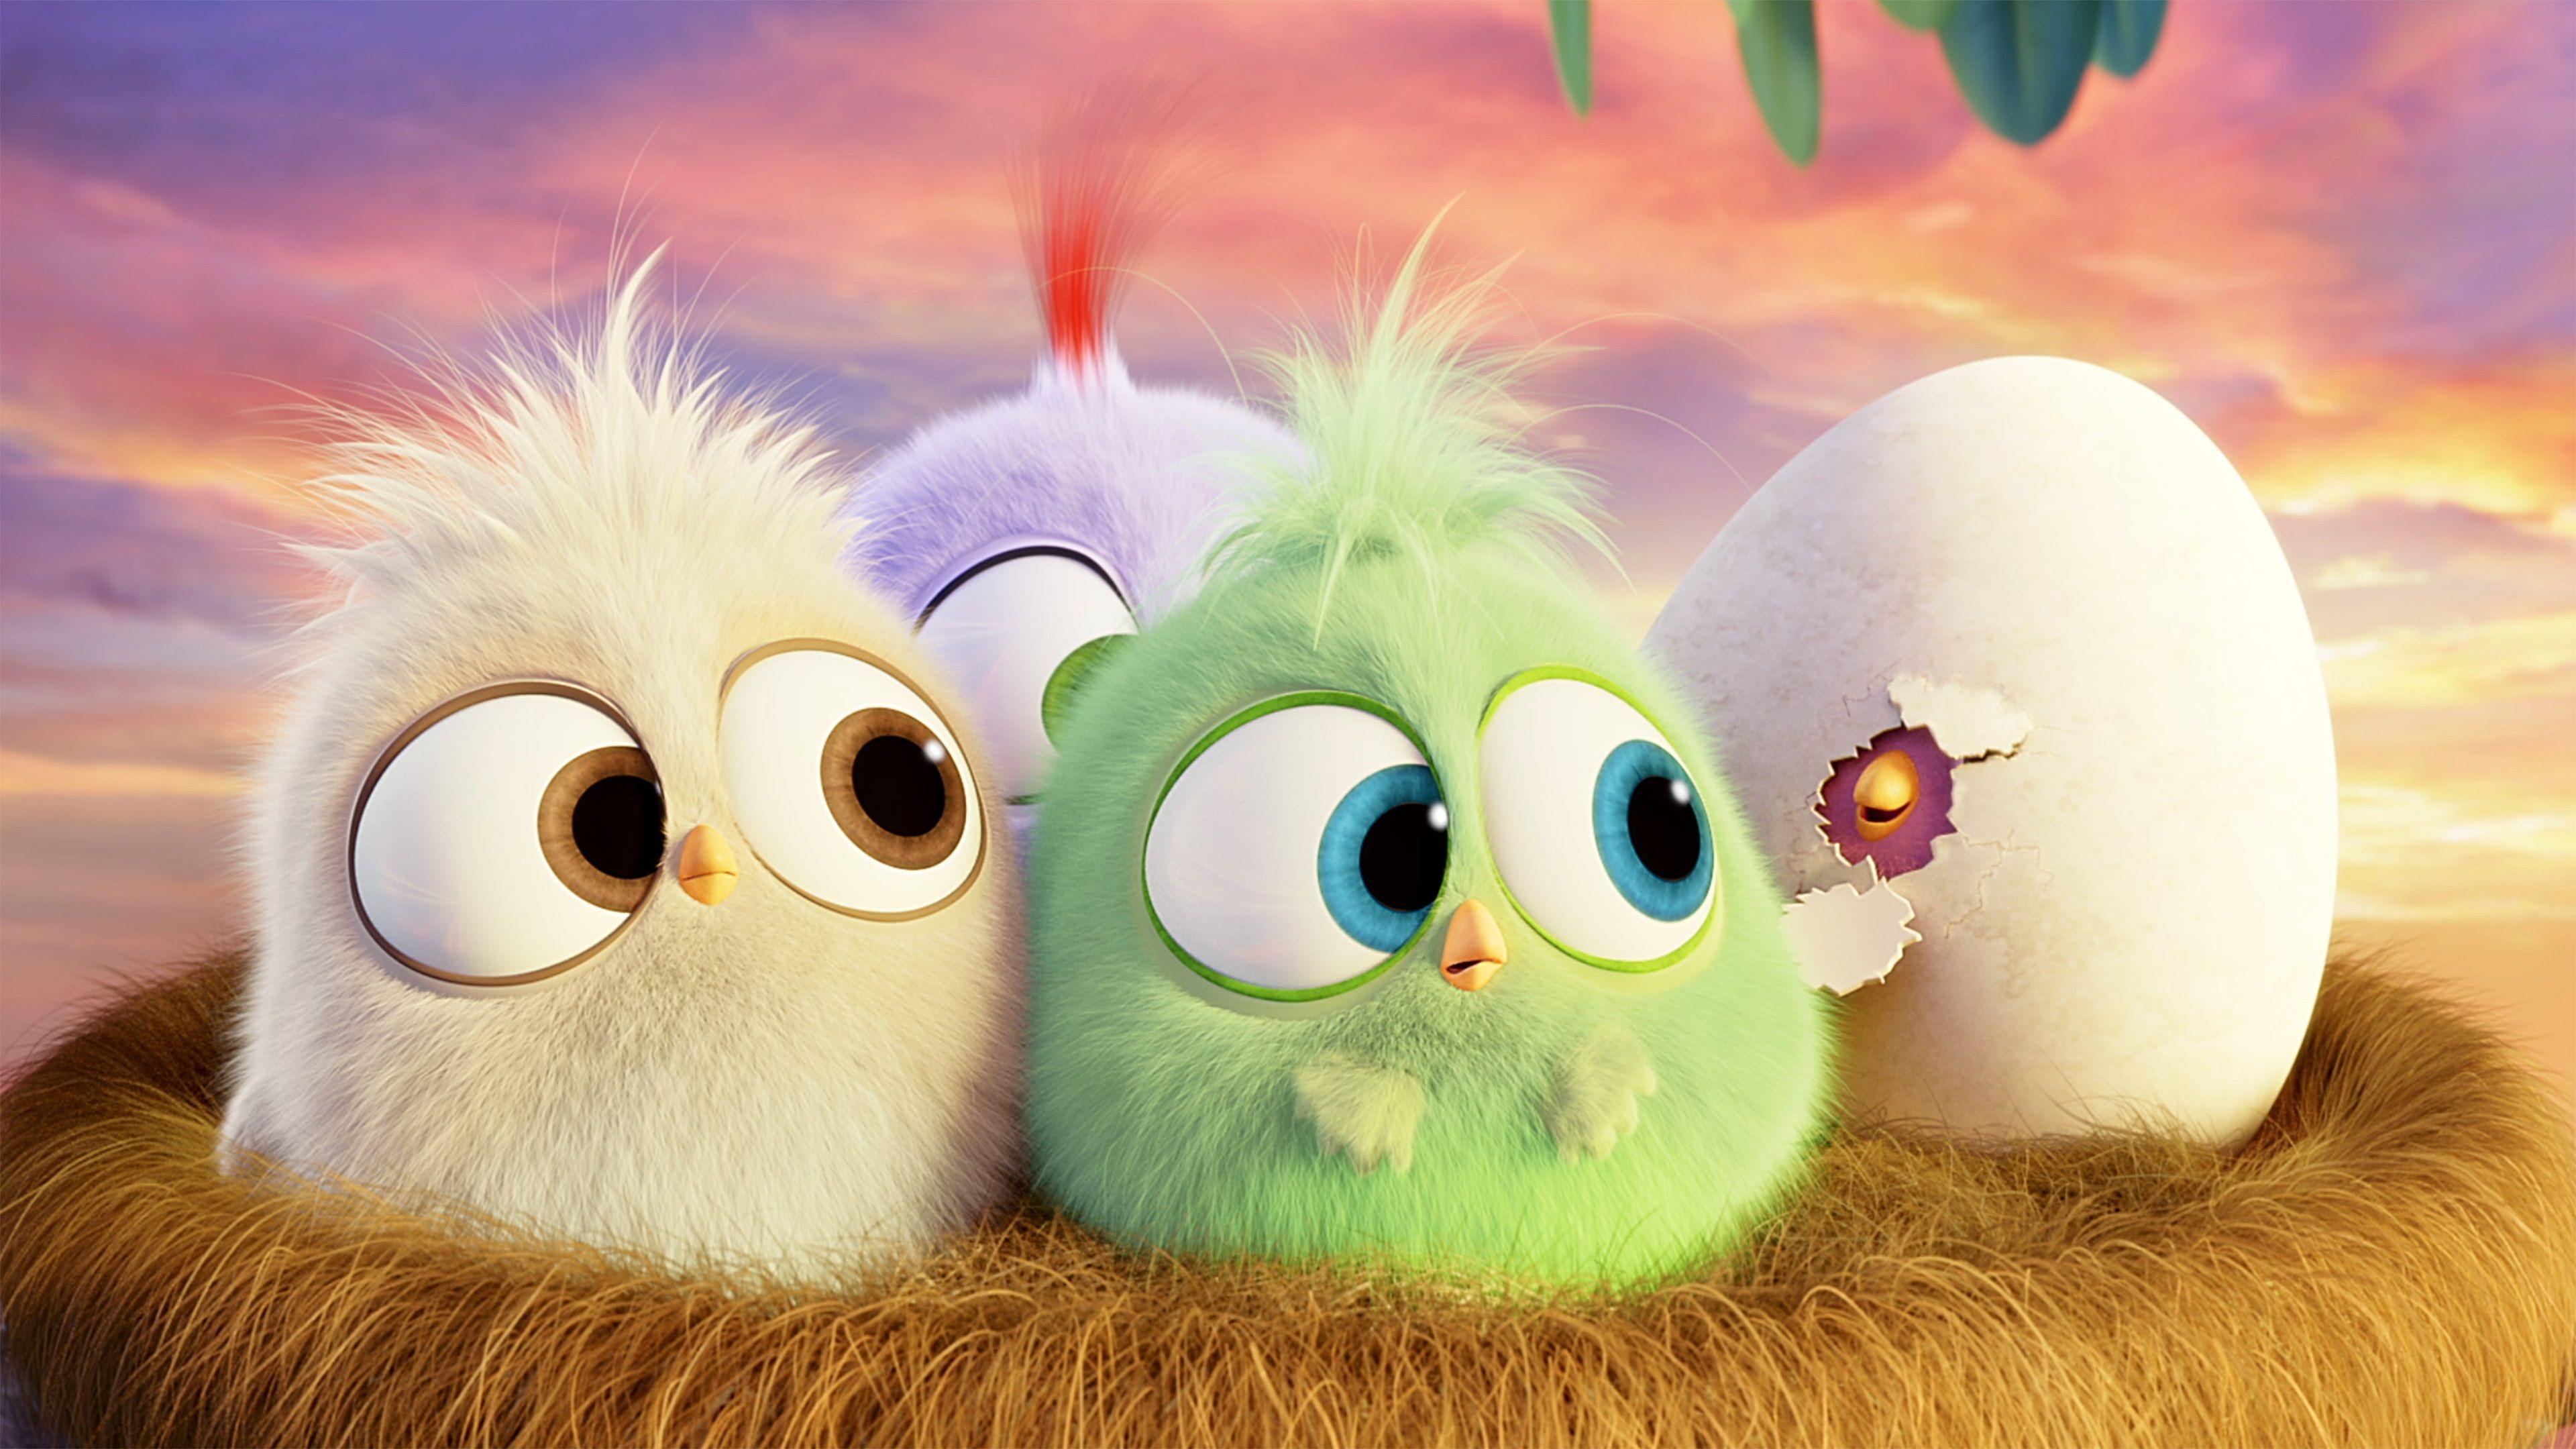 3840x2160 Angry Birds 4k Desktop Wallpaper Cute Birds Cute Cartoon Wallpapers Cute Wallpapers